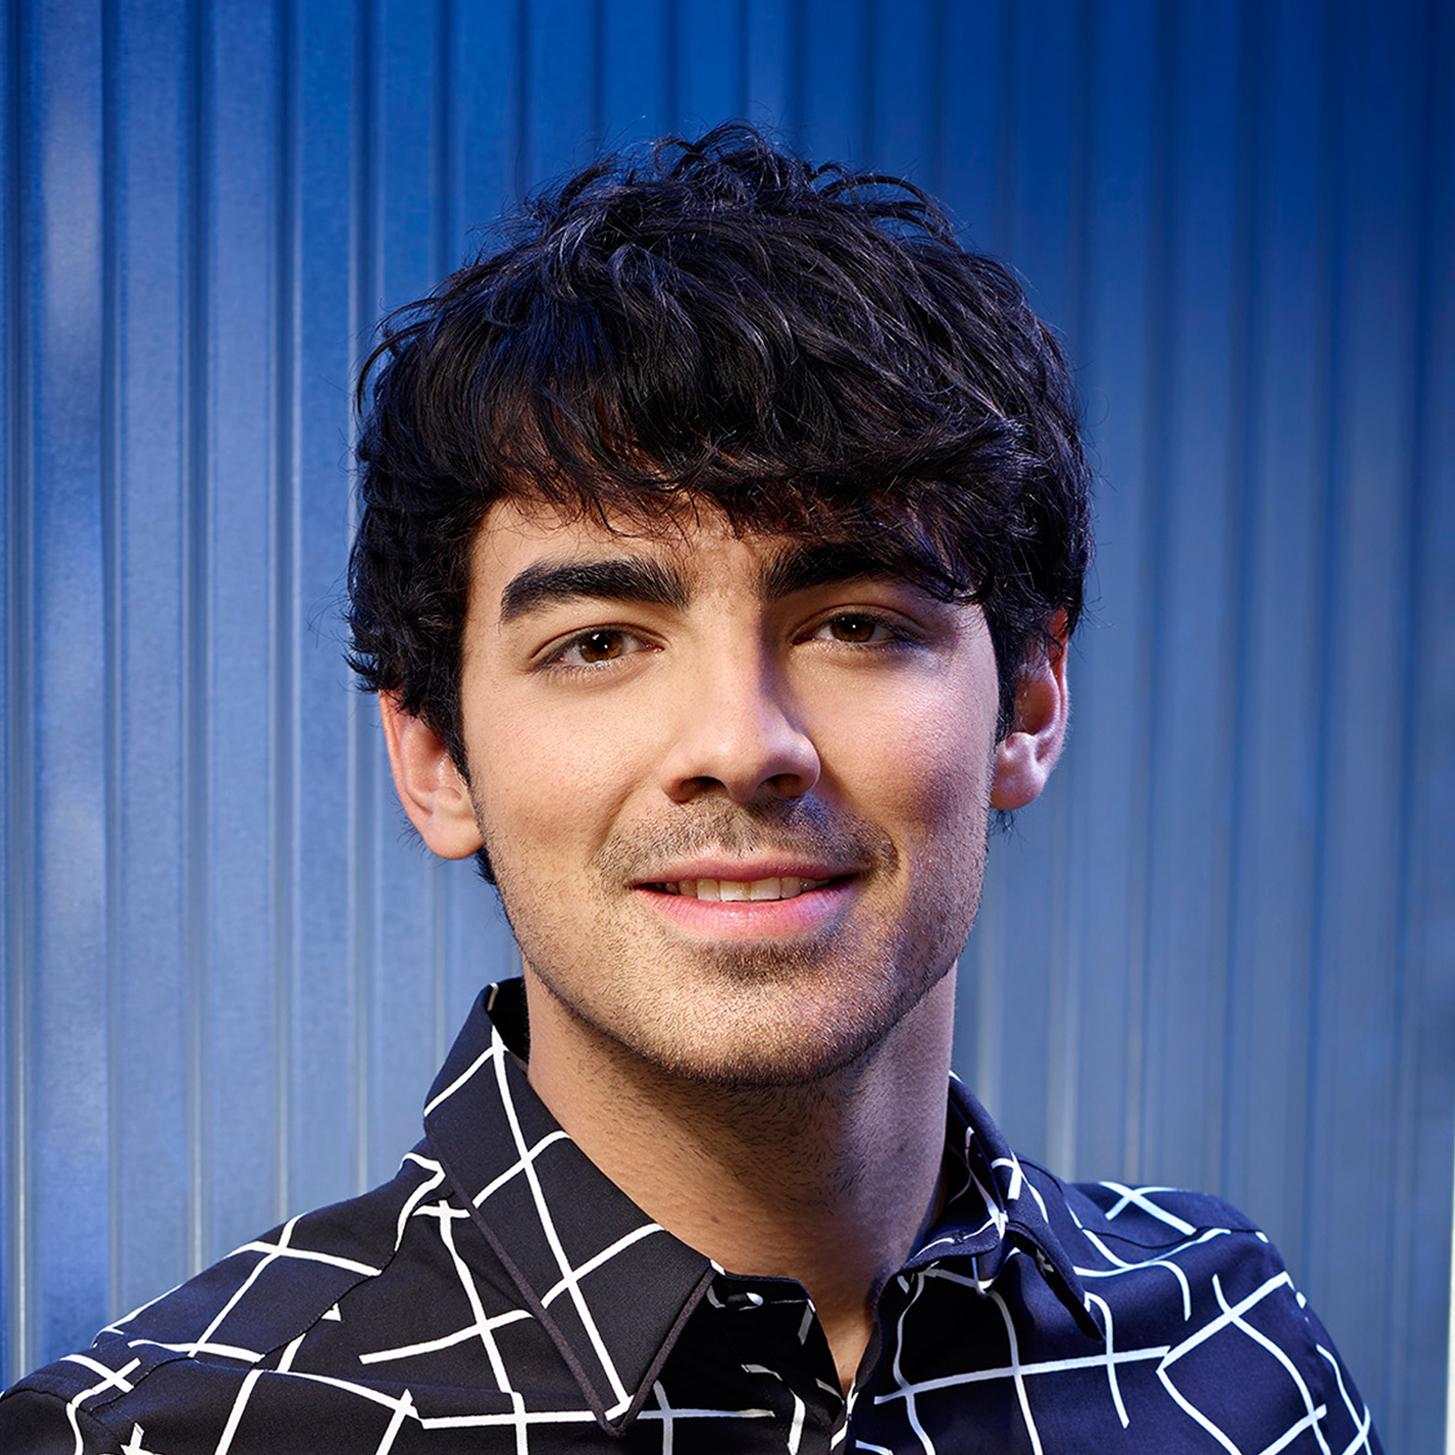 Singer Joe Jonas - age: 27